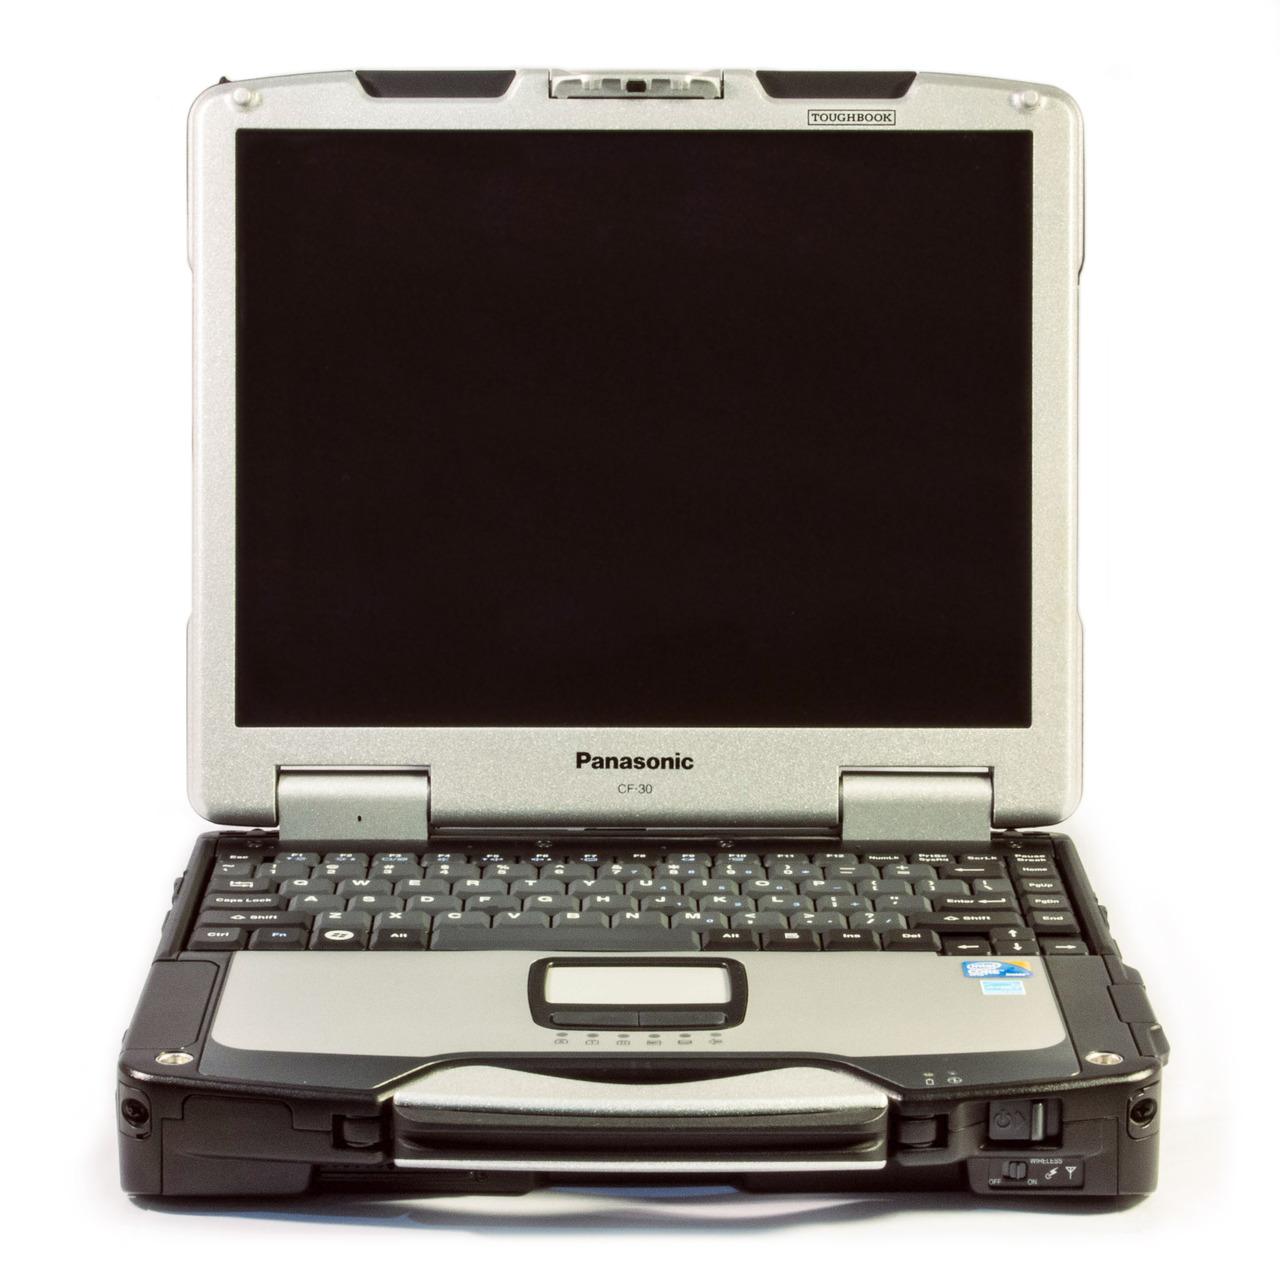 panasonic toughbook cf 30 mk3 touchscreen rh bobjohnson com Samsung Laptop Panasonic Laptop Support